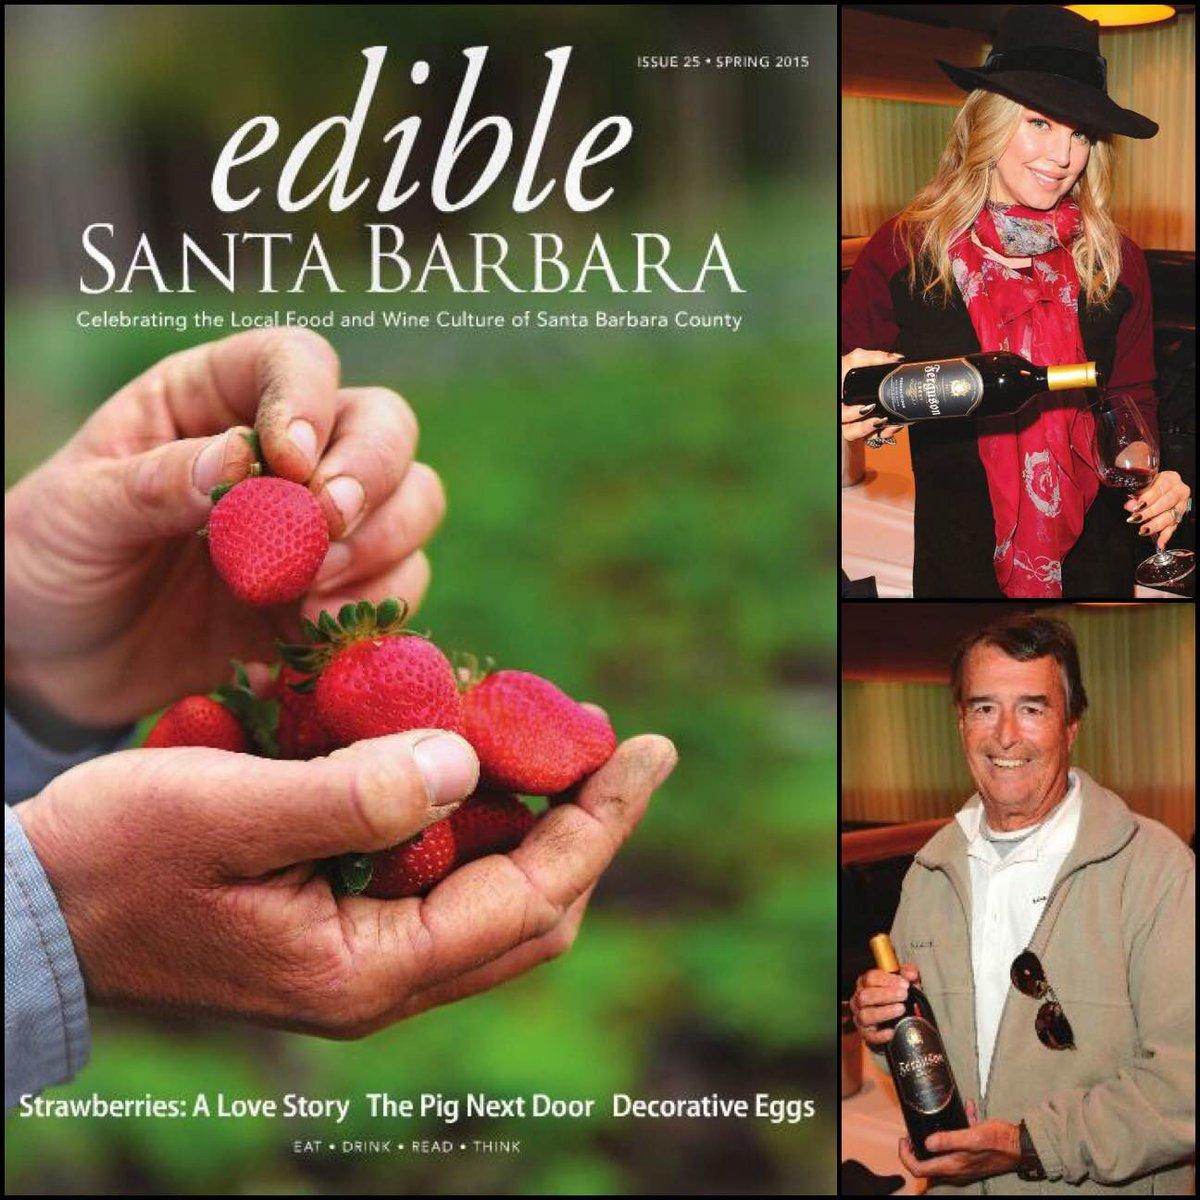 RT @FergusonCrest: #ICYMI: How @Fergie & dad #PatFerguson r rocking the #wineworld in @EdibleSB #Spring2015 issue!http://t.co/WJb1WbN7o8 ht…